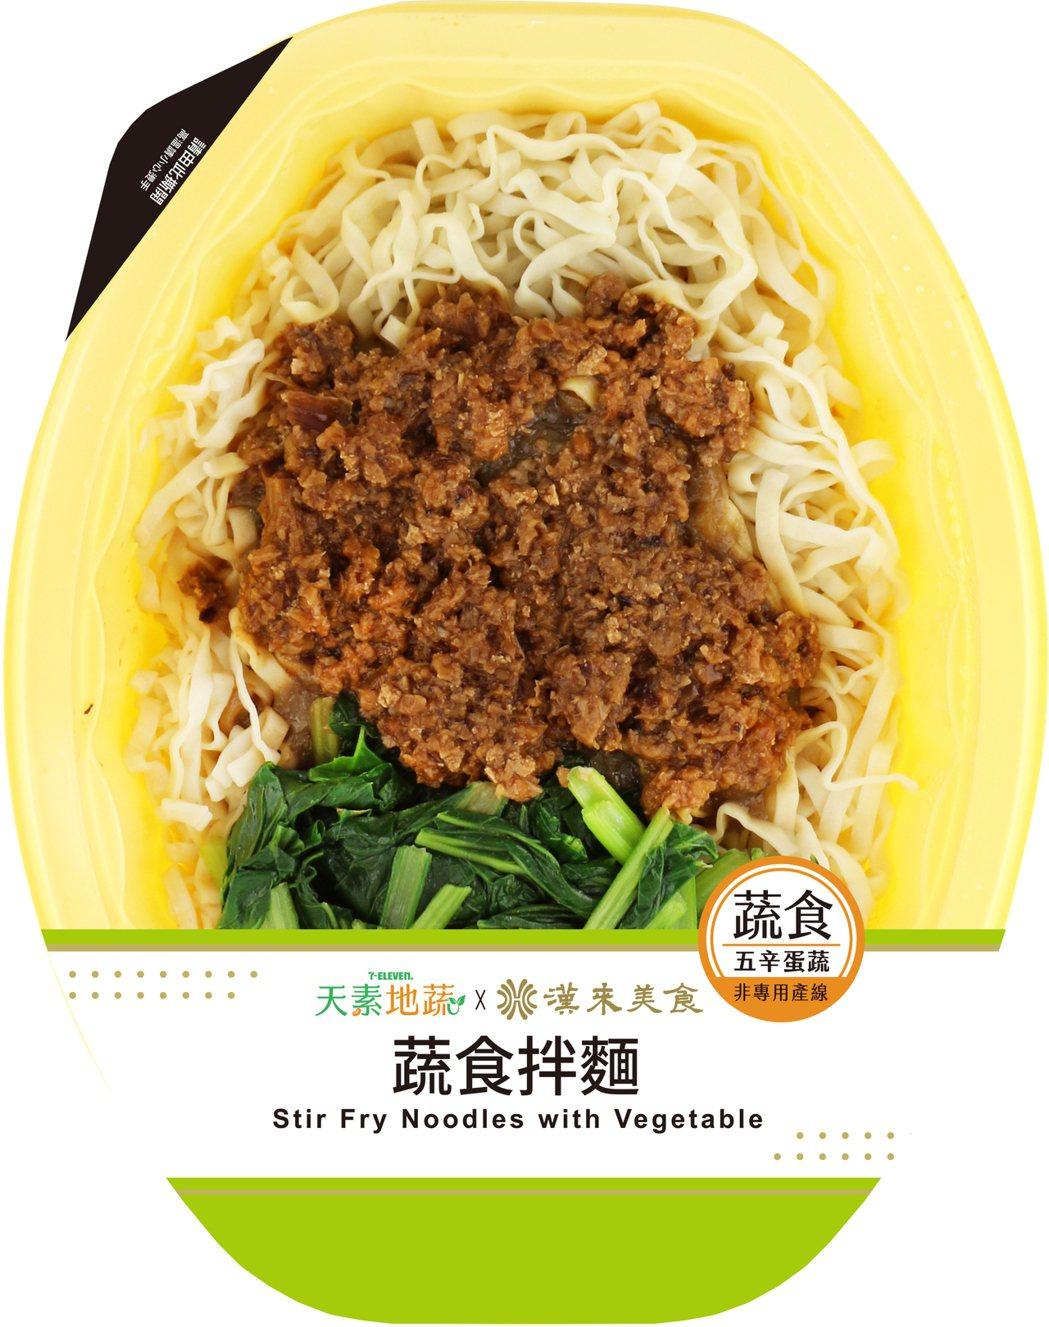 7-ELEVEN推出「漢來美食蔬食拌麵」(五辛蛋蔬),售價75元,7-ELEVE...